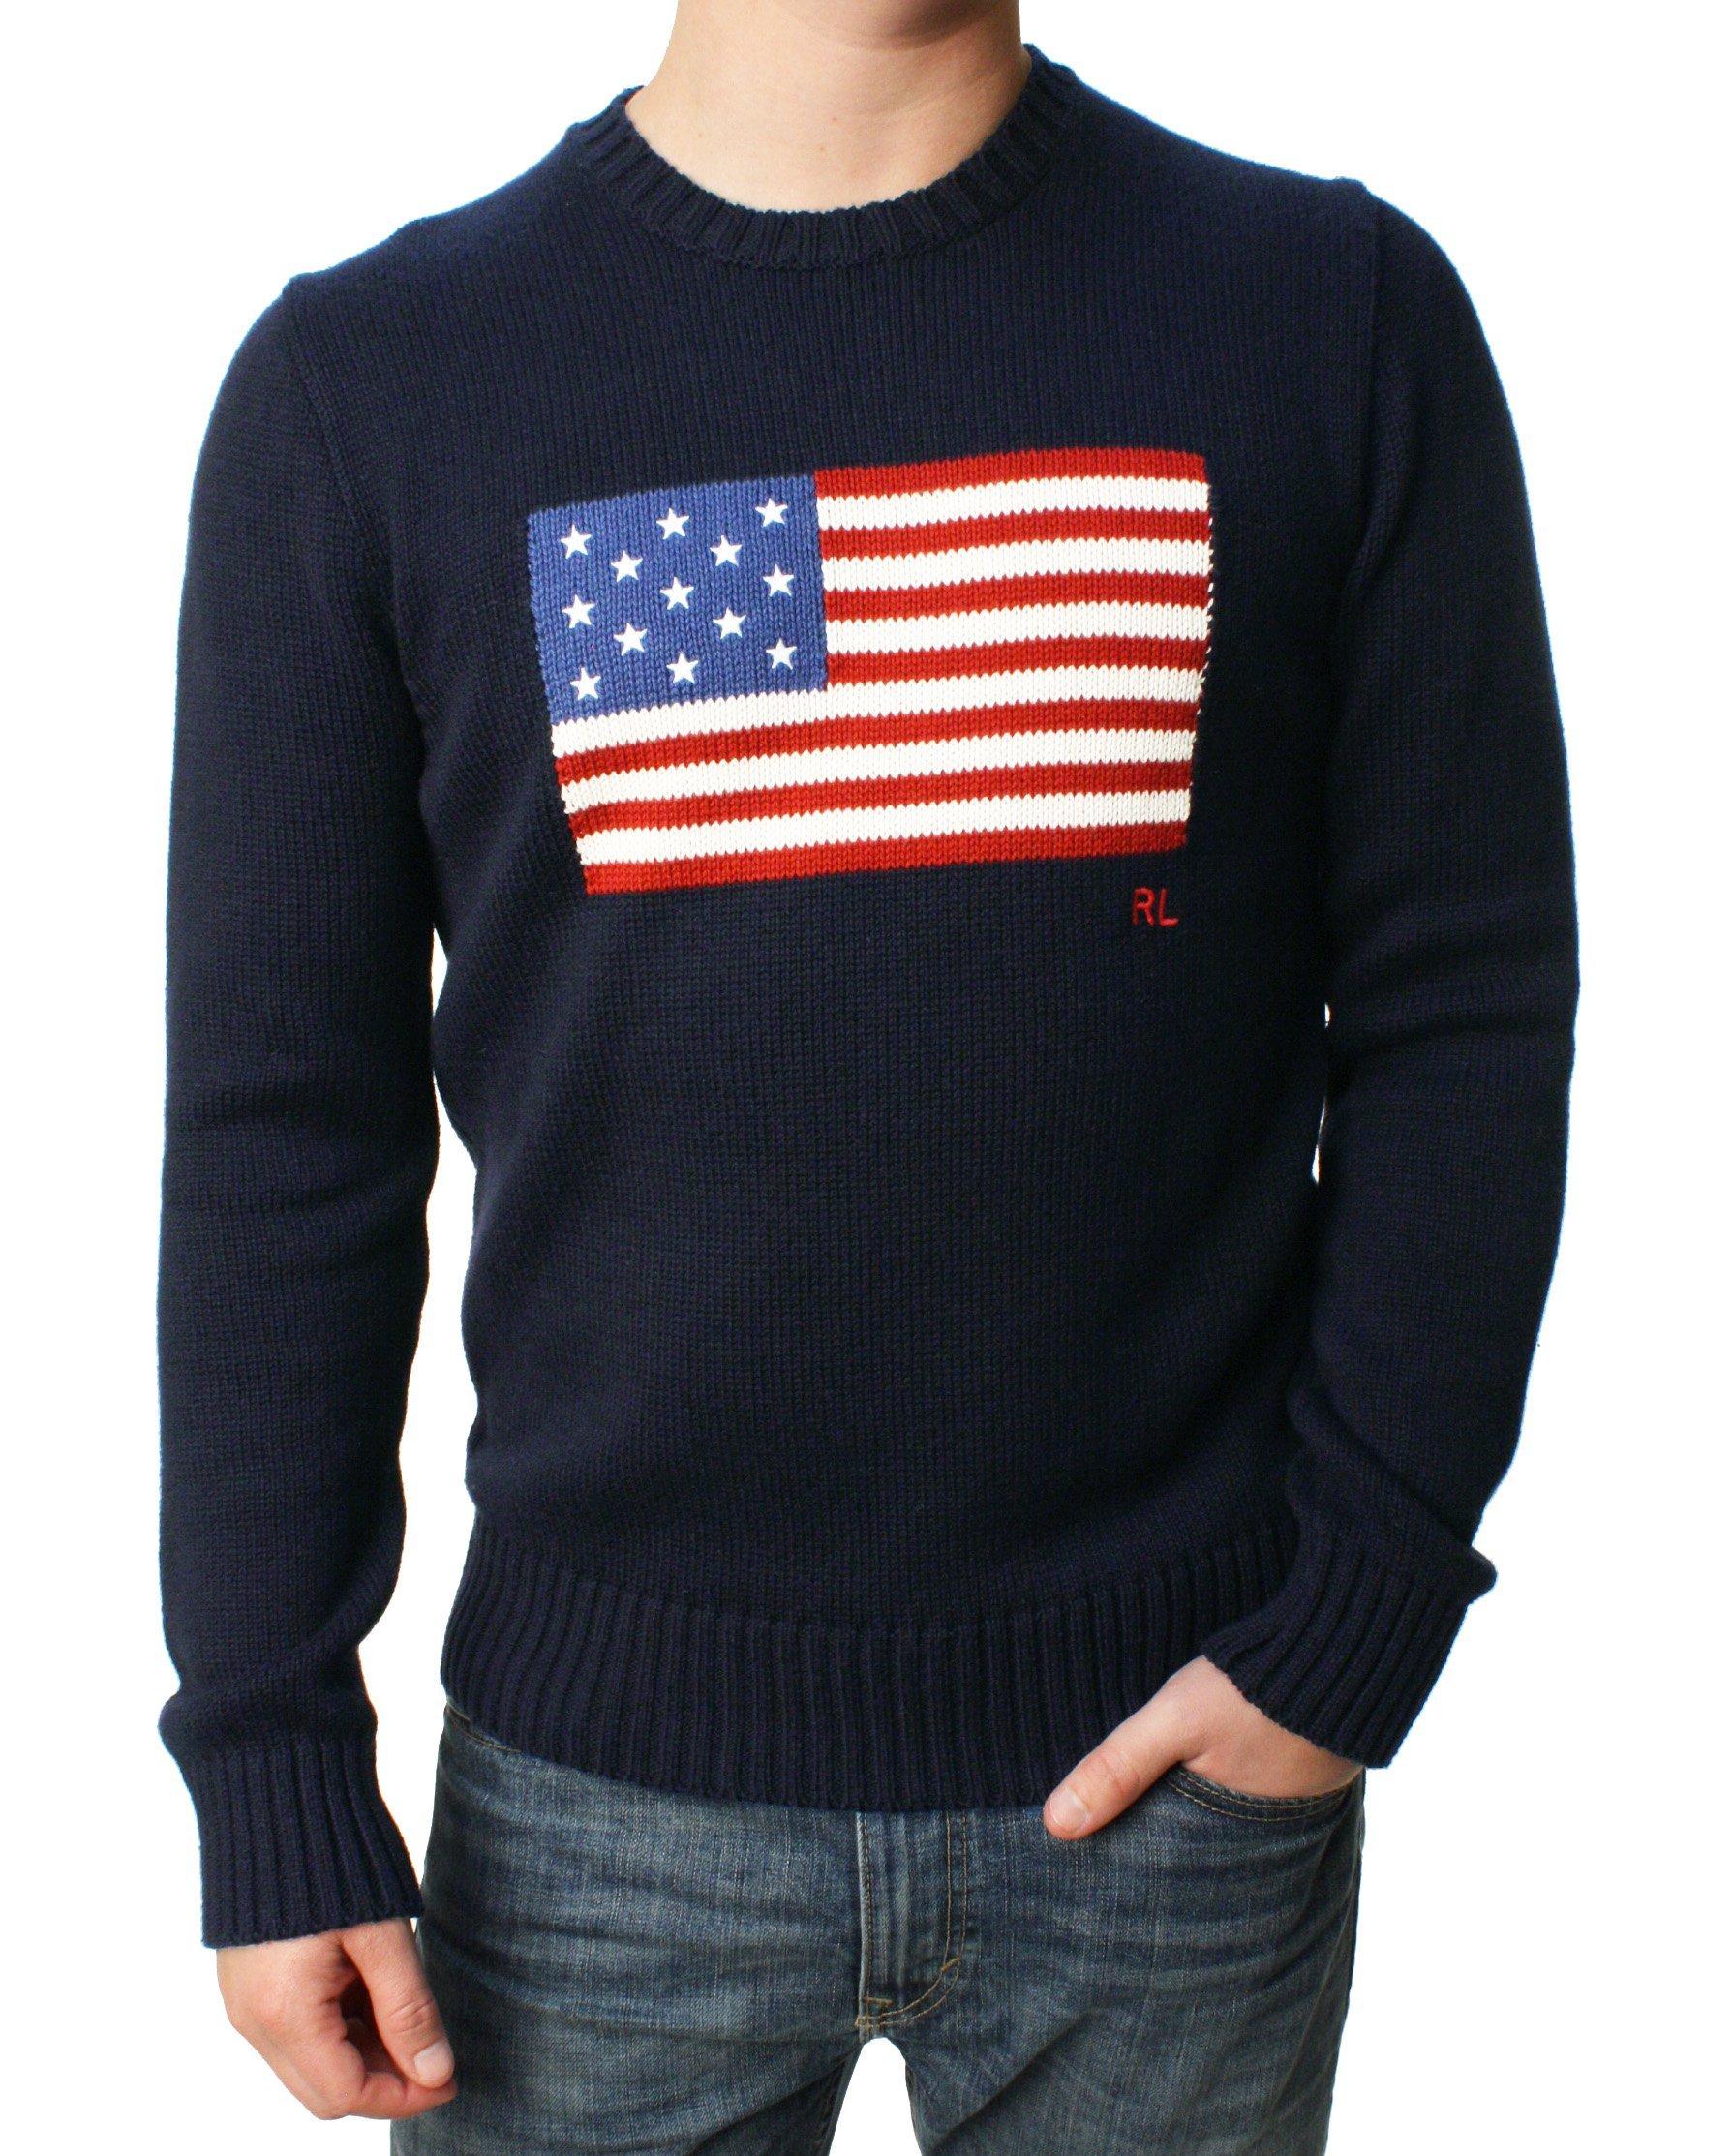 Polo Ralph Lauren Men's Flag Cotton Crew Neck Sweater USA Flag RL Embroidered Navy USA Flag Size X-Large